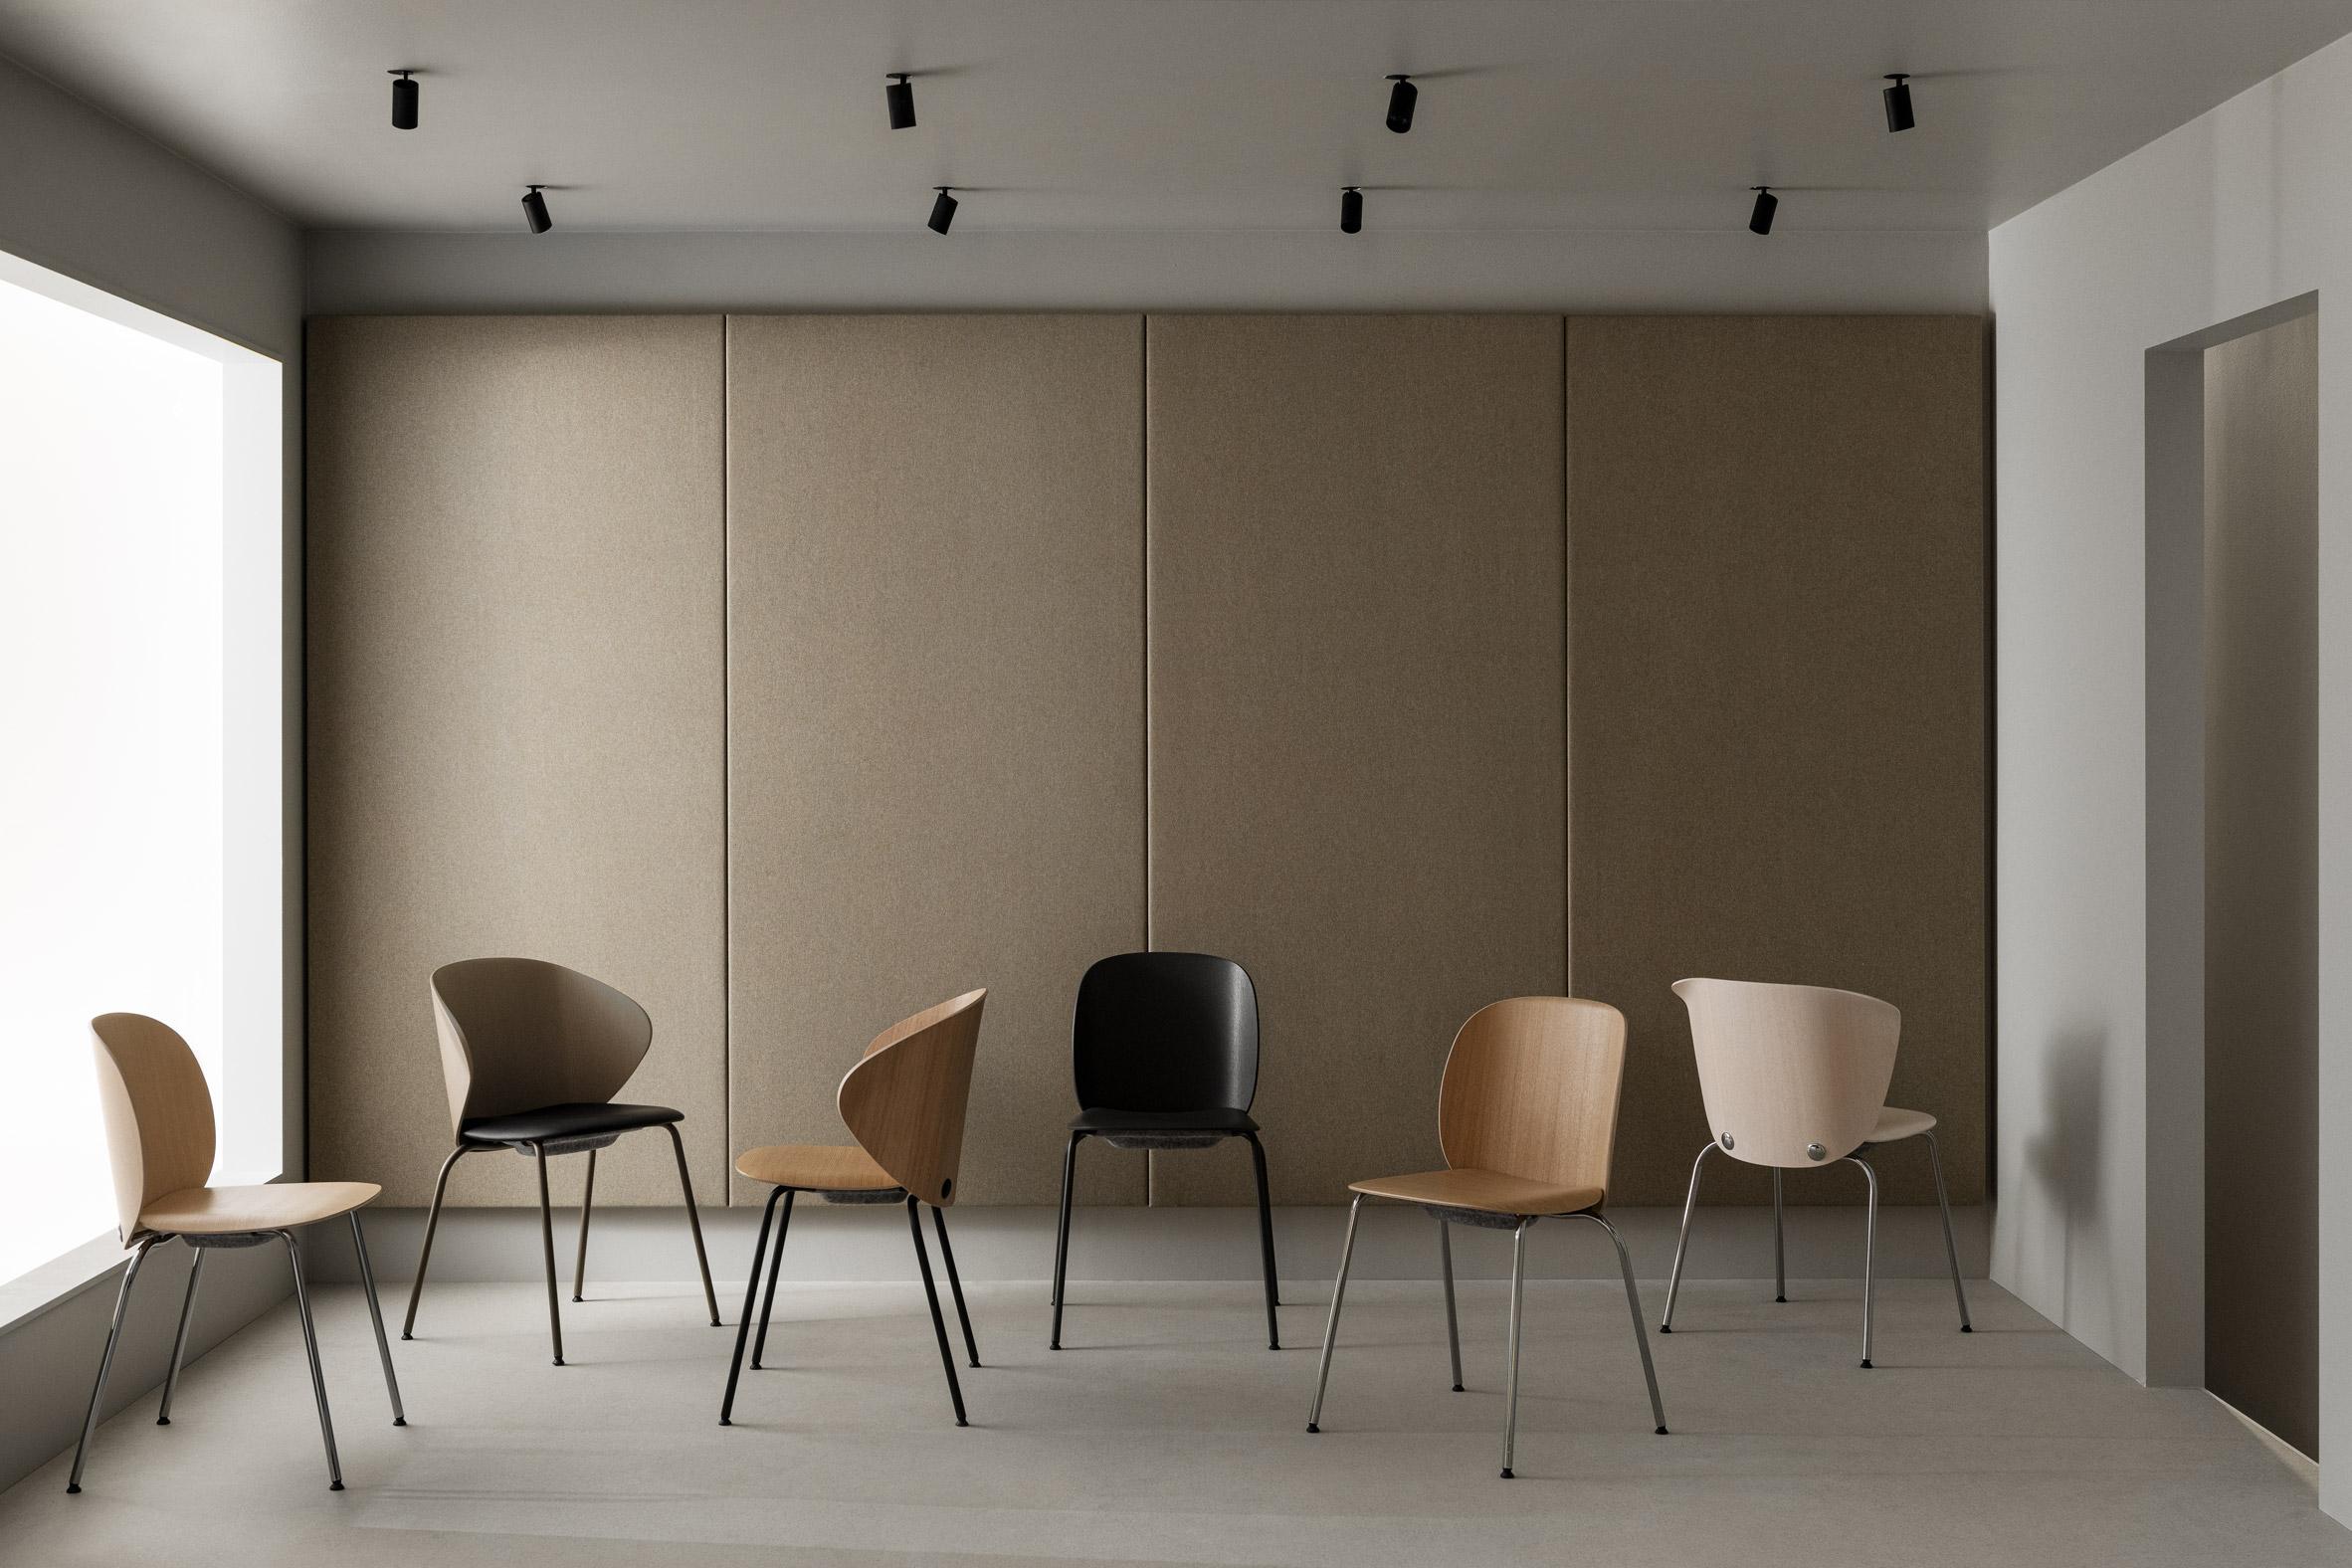 Showroom by Atelier Paul Vaugoyeau